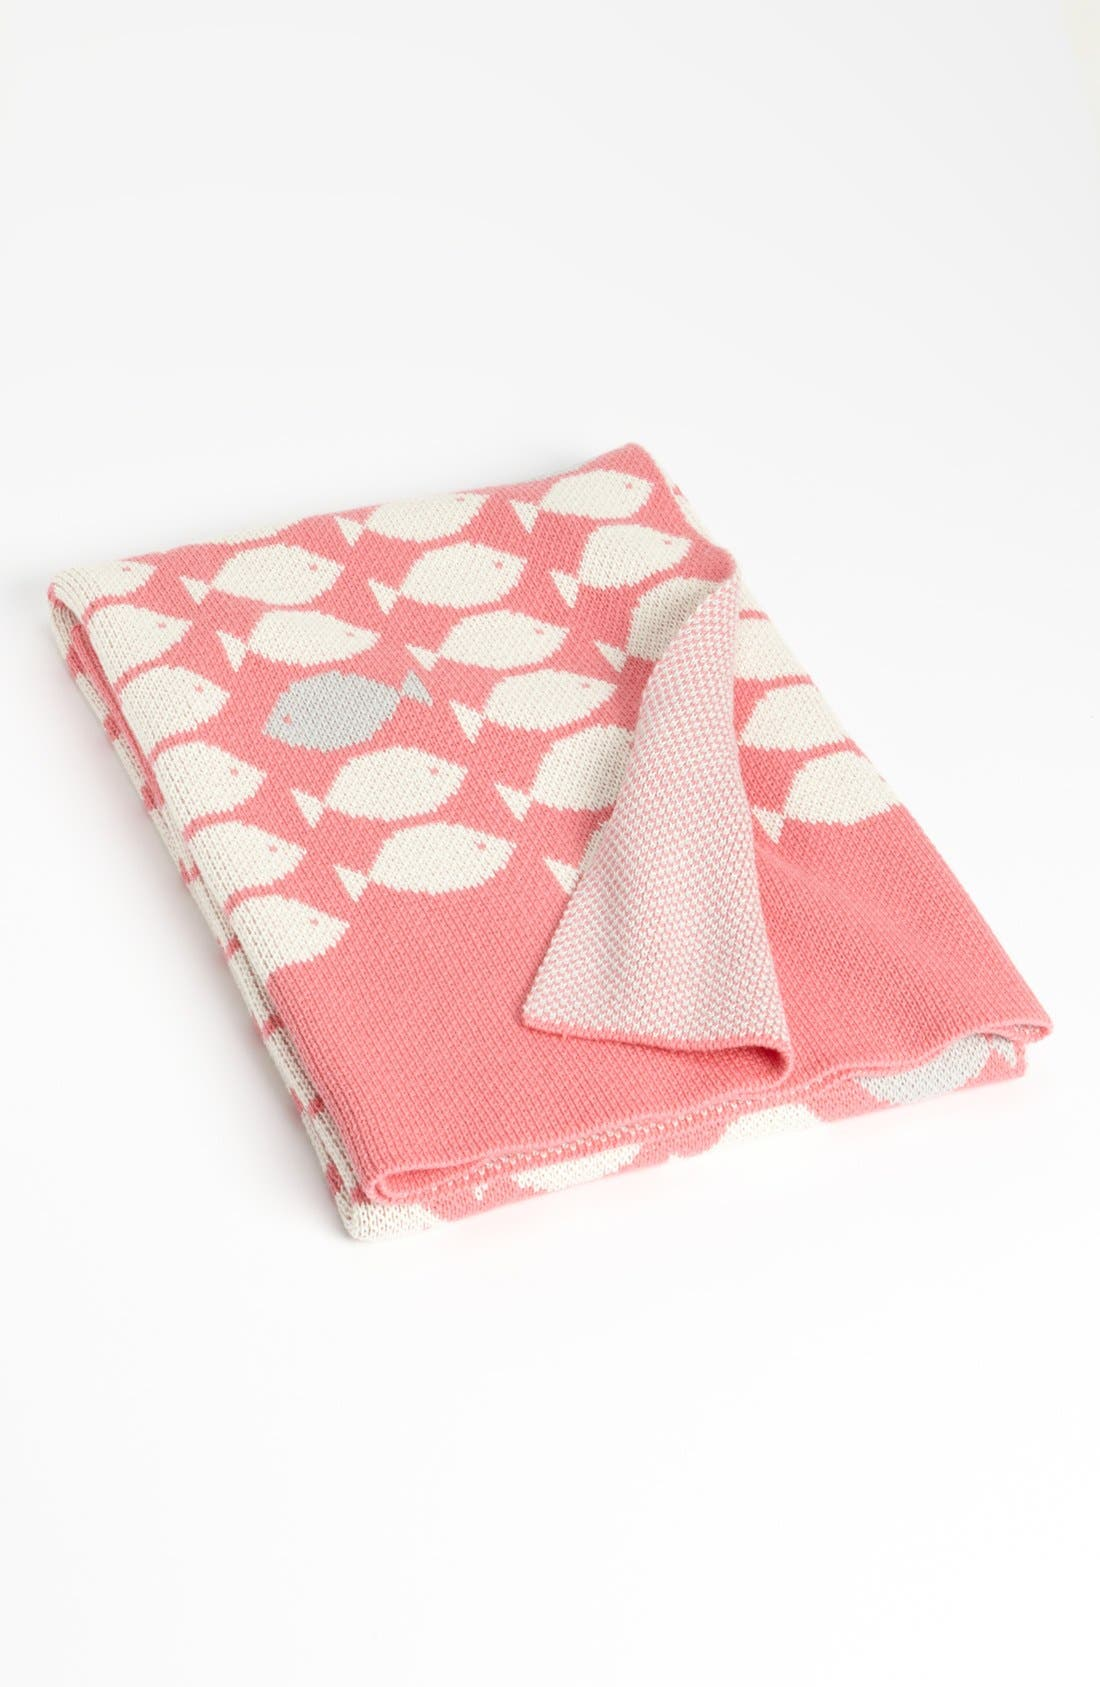 Alternate Image 1 Selected - Stem Baby 'Fashion' Organic Cotton Blanket